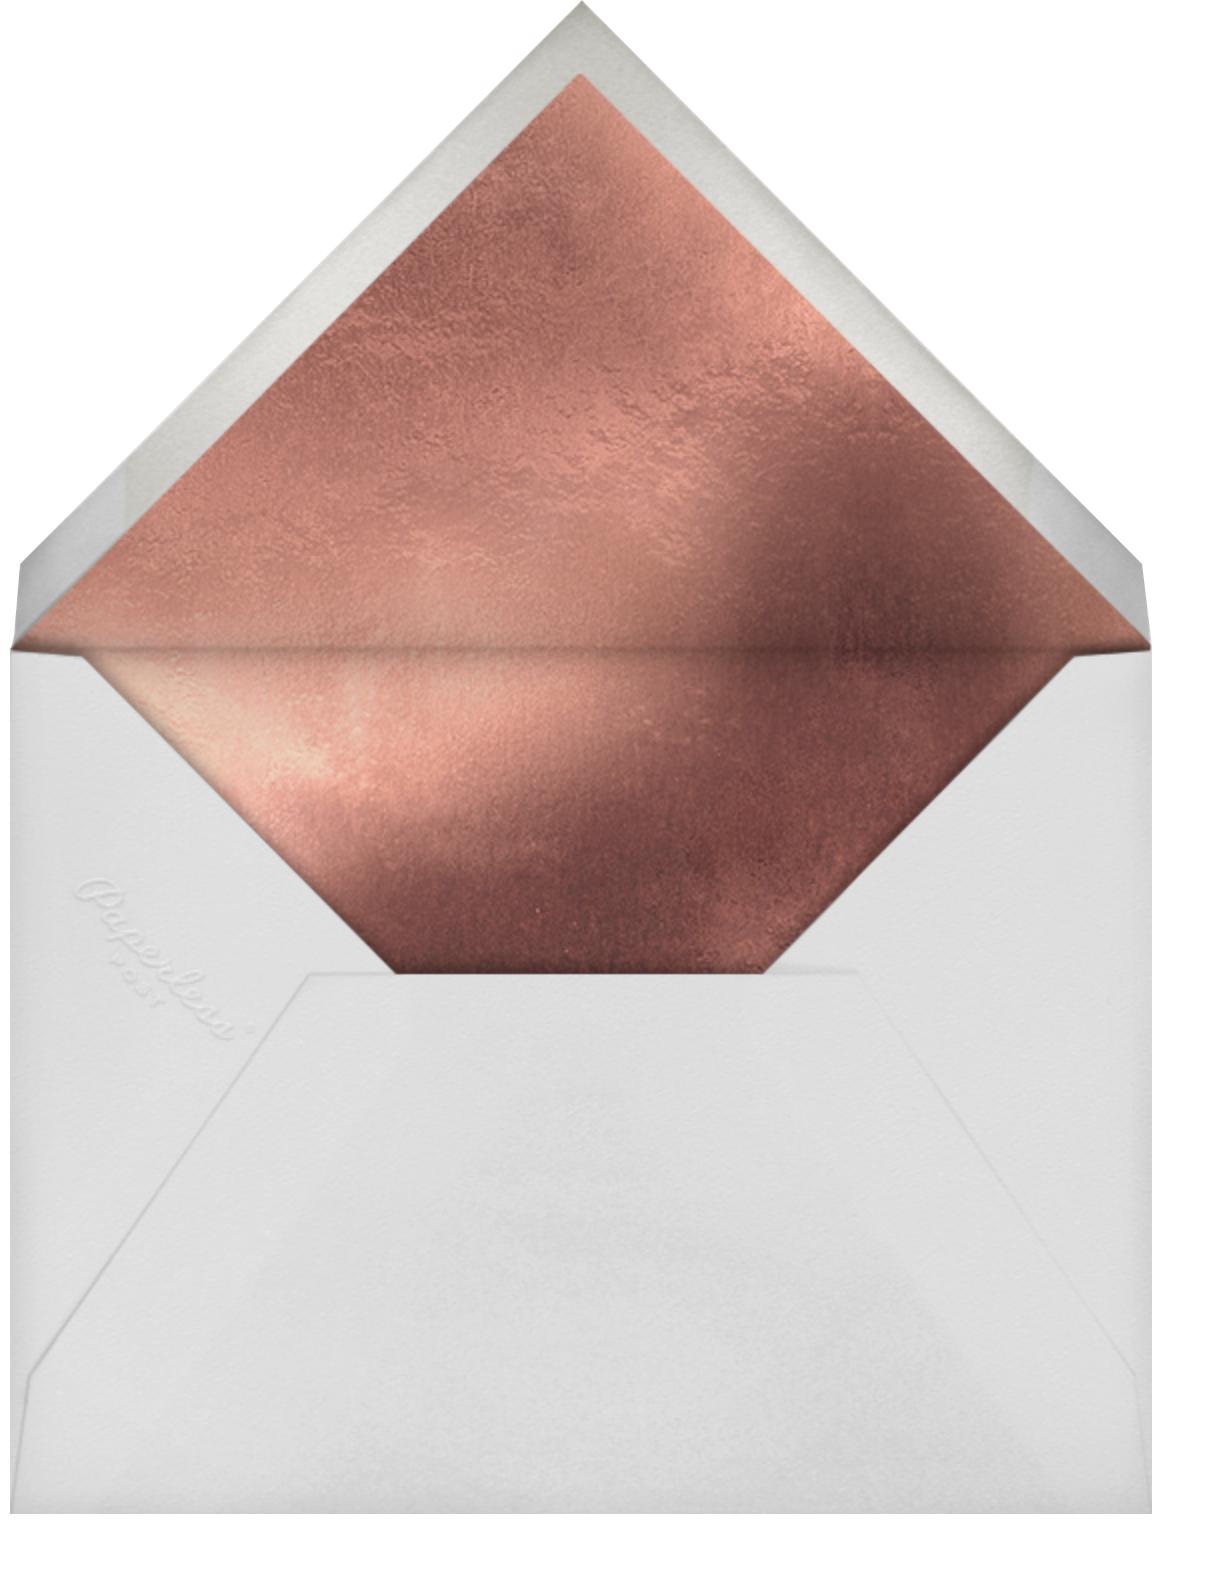 Sky Glitter - Meringue - kate spade new york - Holiday party - envelope back